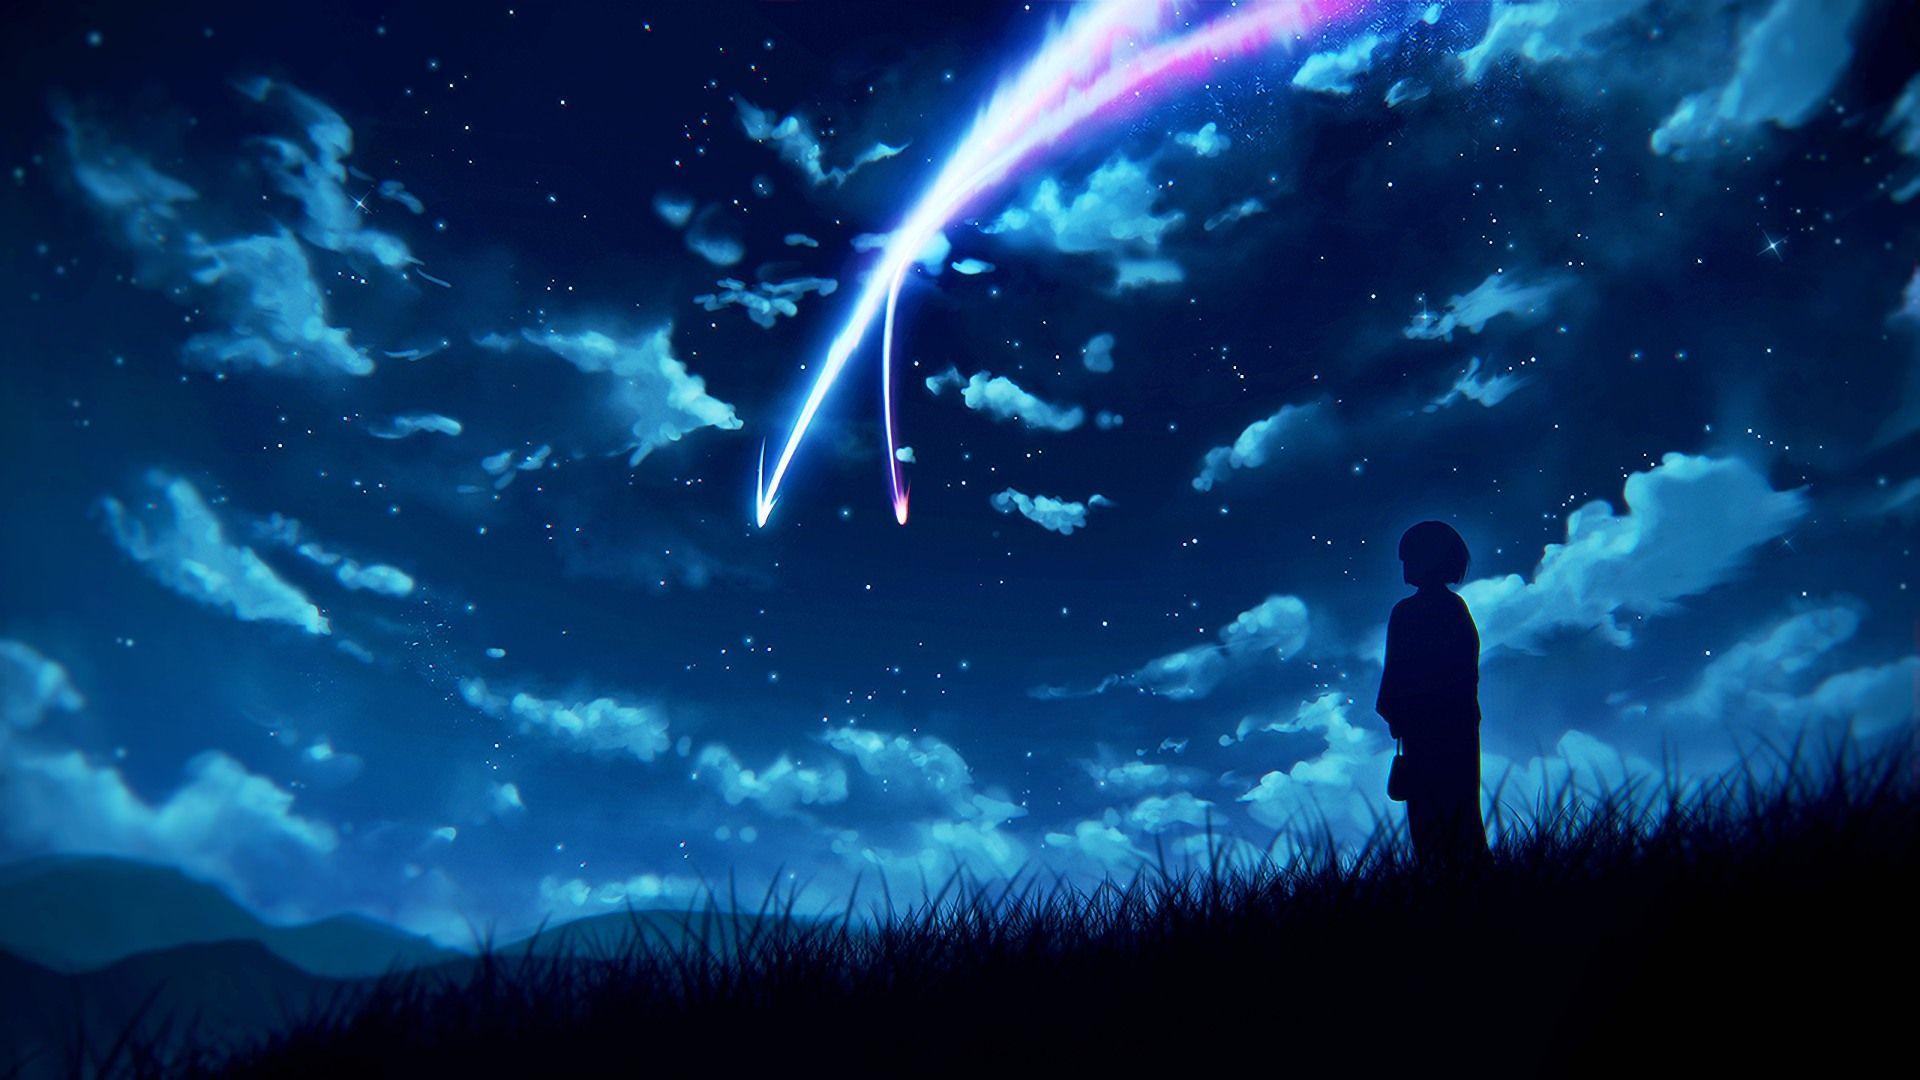 Night Anime Scenery Wallpapers 1080p Jpg 1920 1080 Kimi No Na